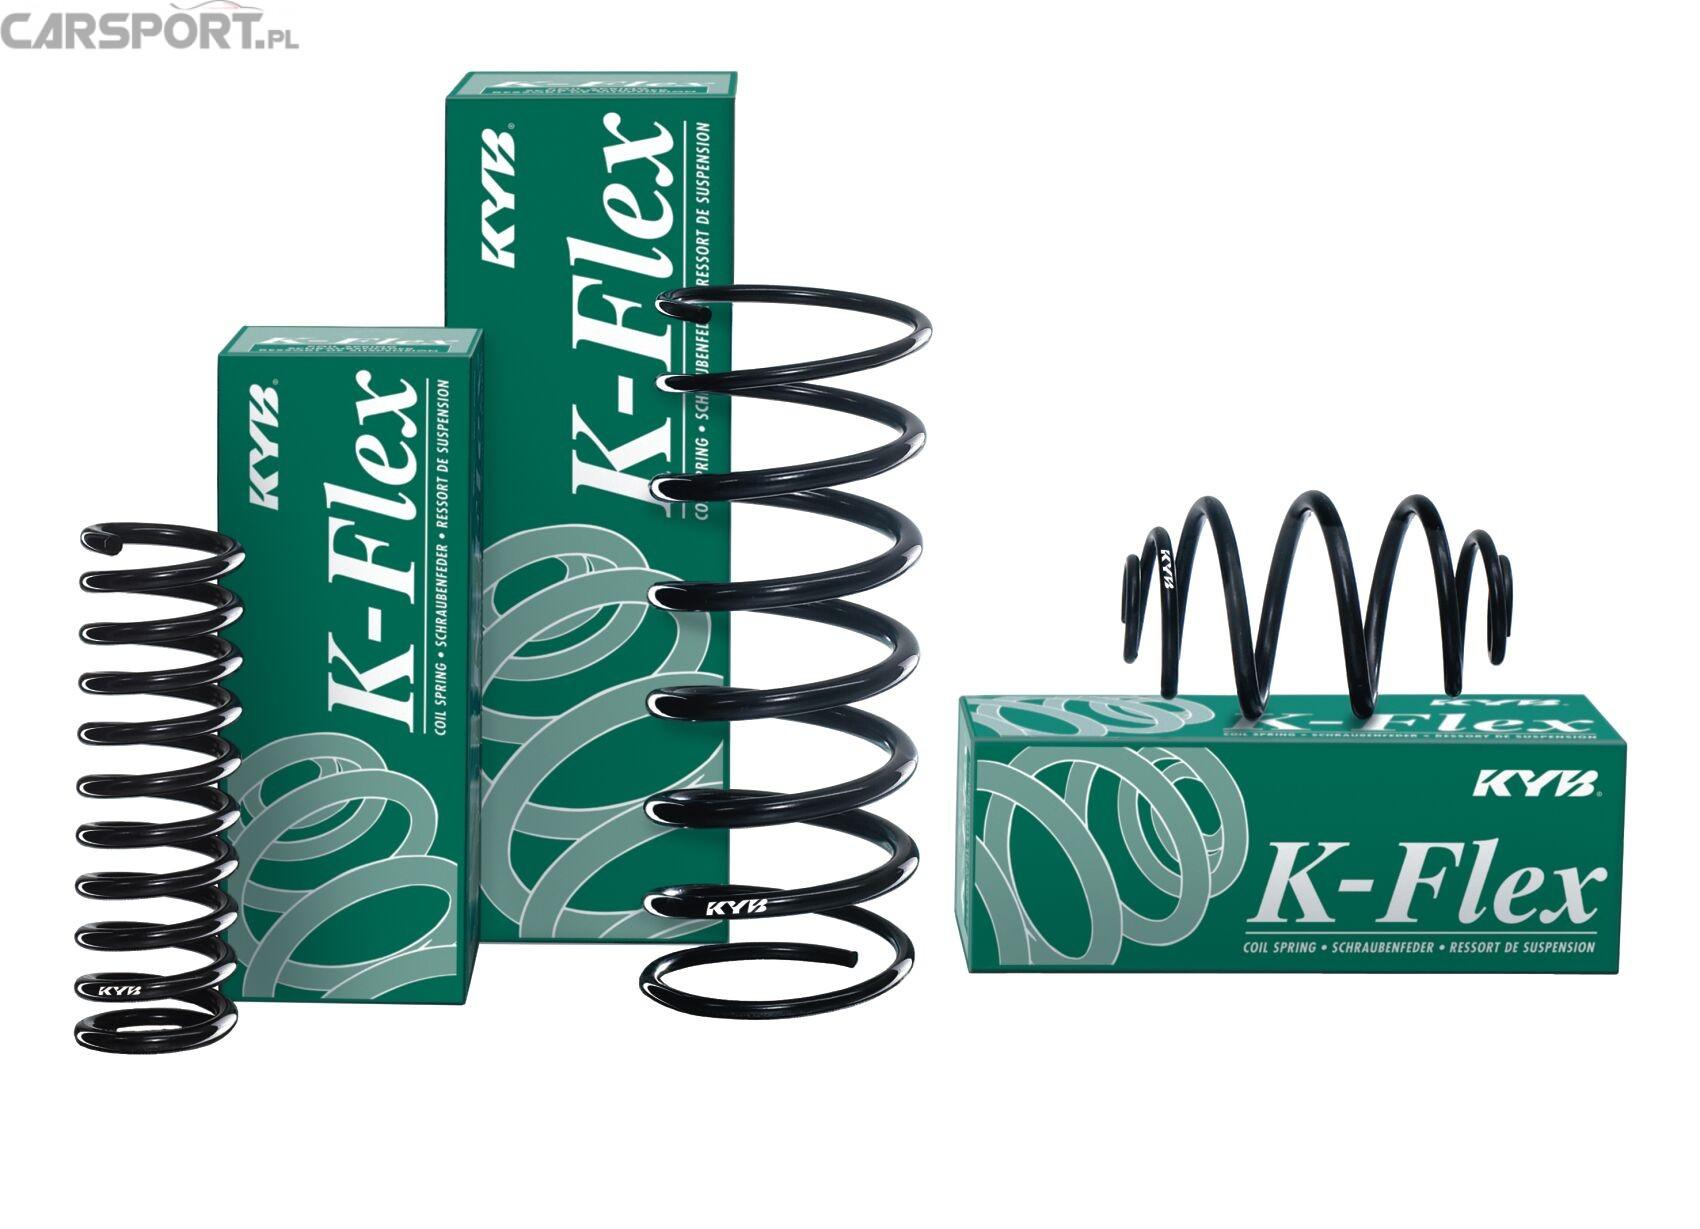 Sprężyna Kayaba do Subaru Forester (SG) 02-08 tył